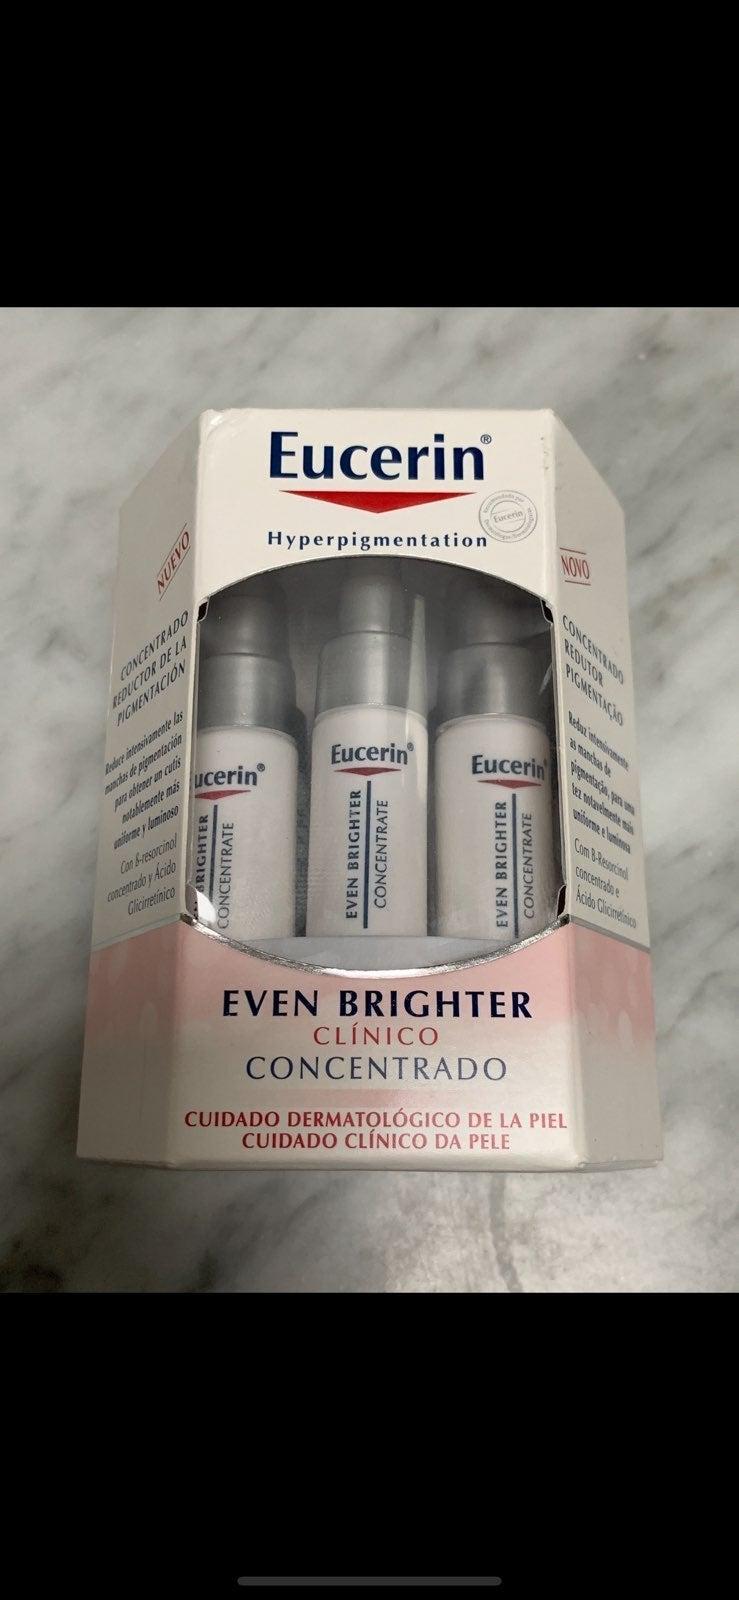 Eucerin Hyperpigmentation Melasma Serum